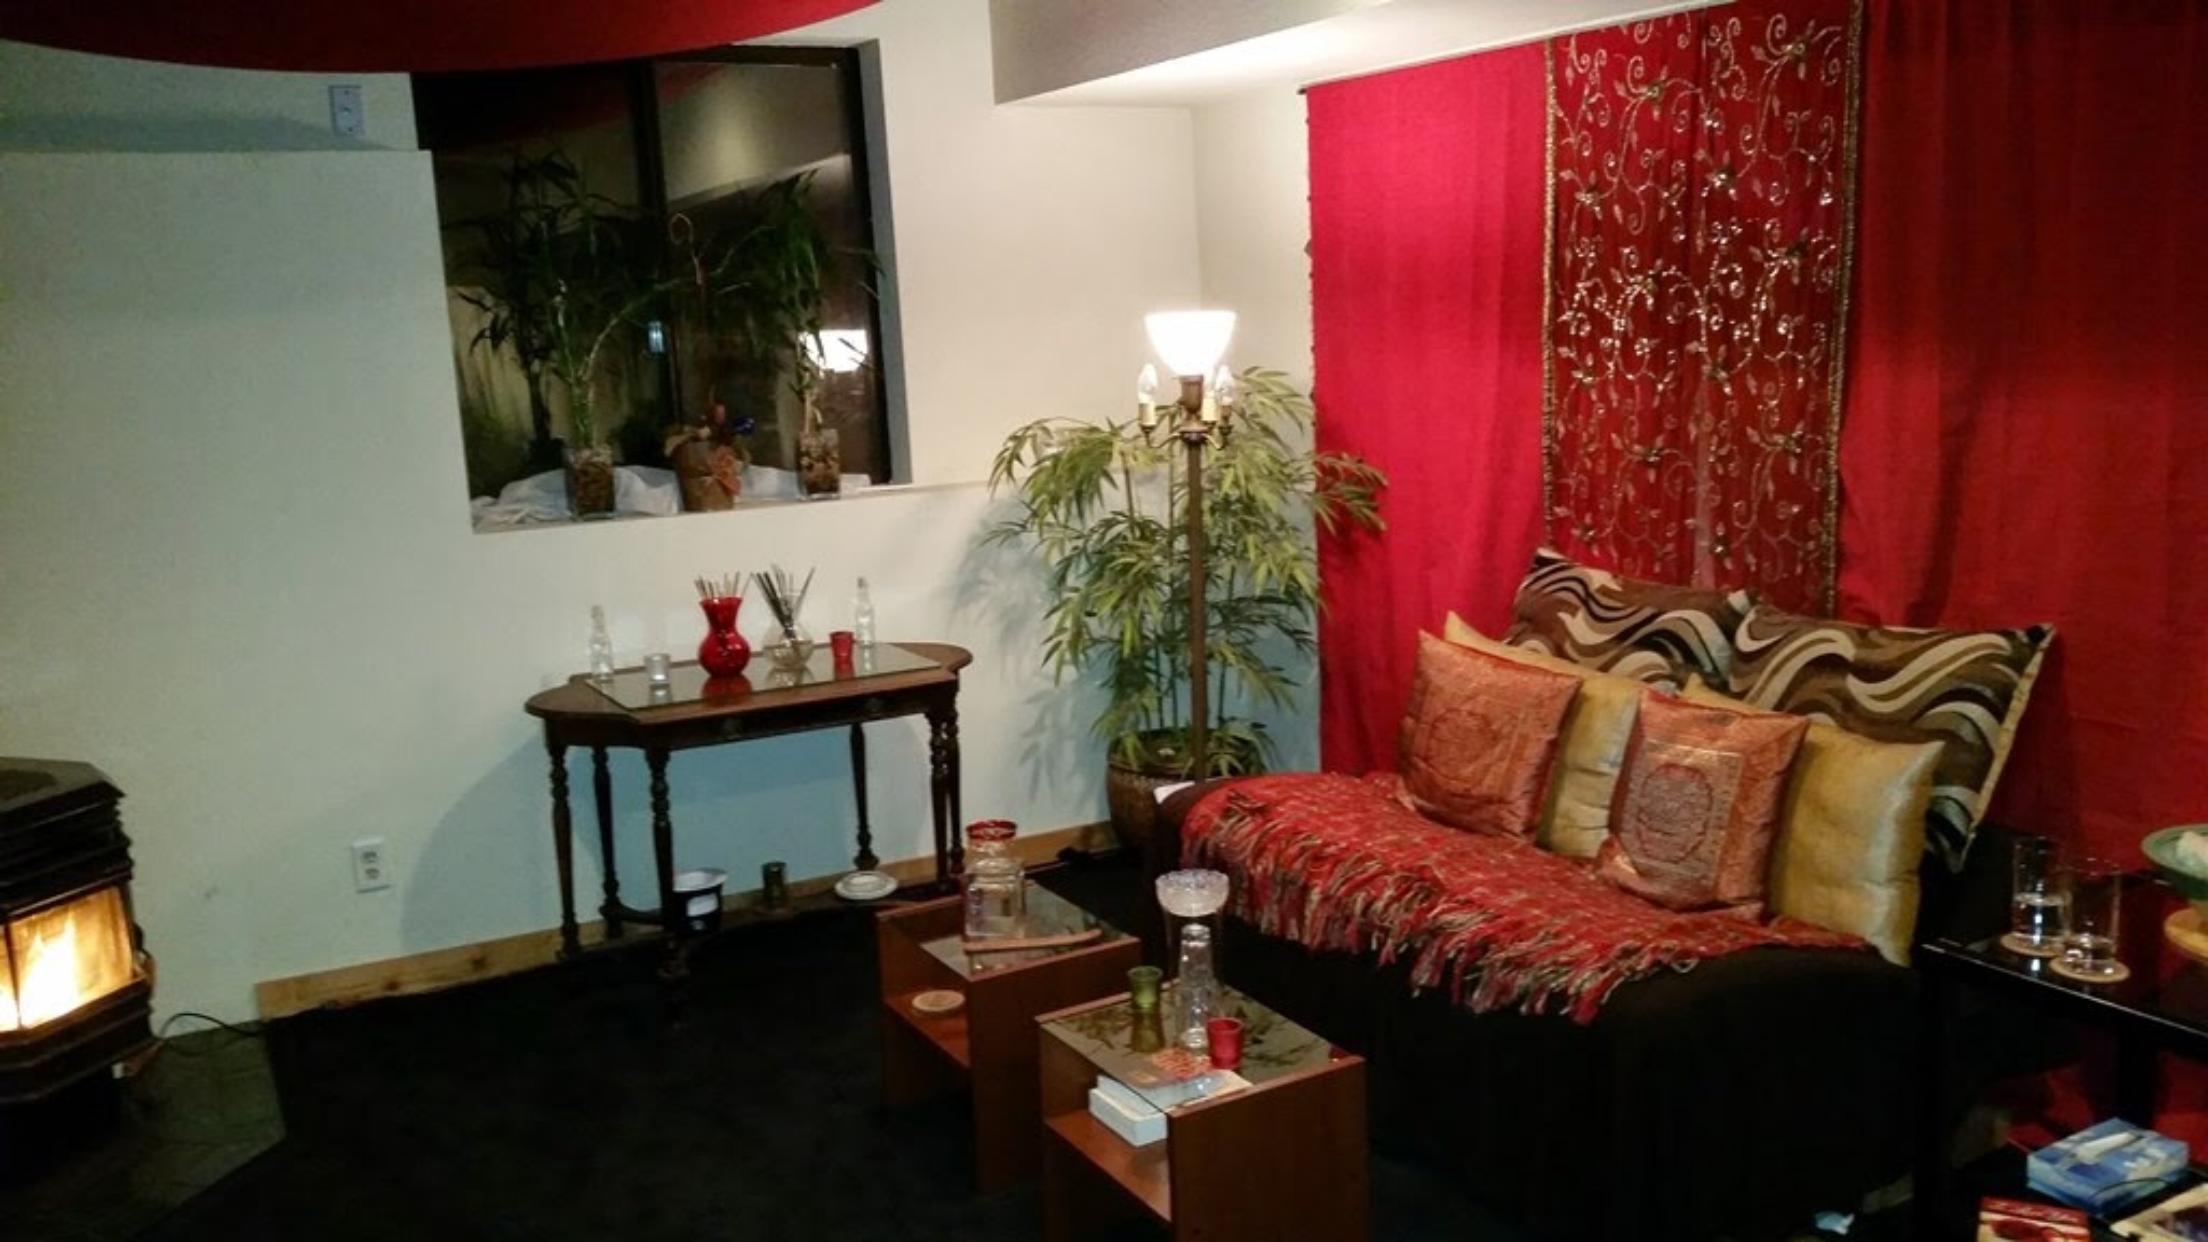 Sharingwood Cohousing 1bed/1bath daylight apartment Snohomish